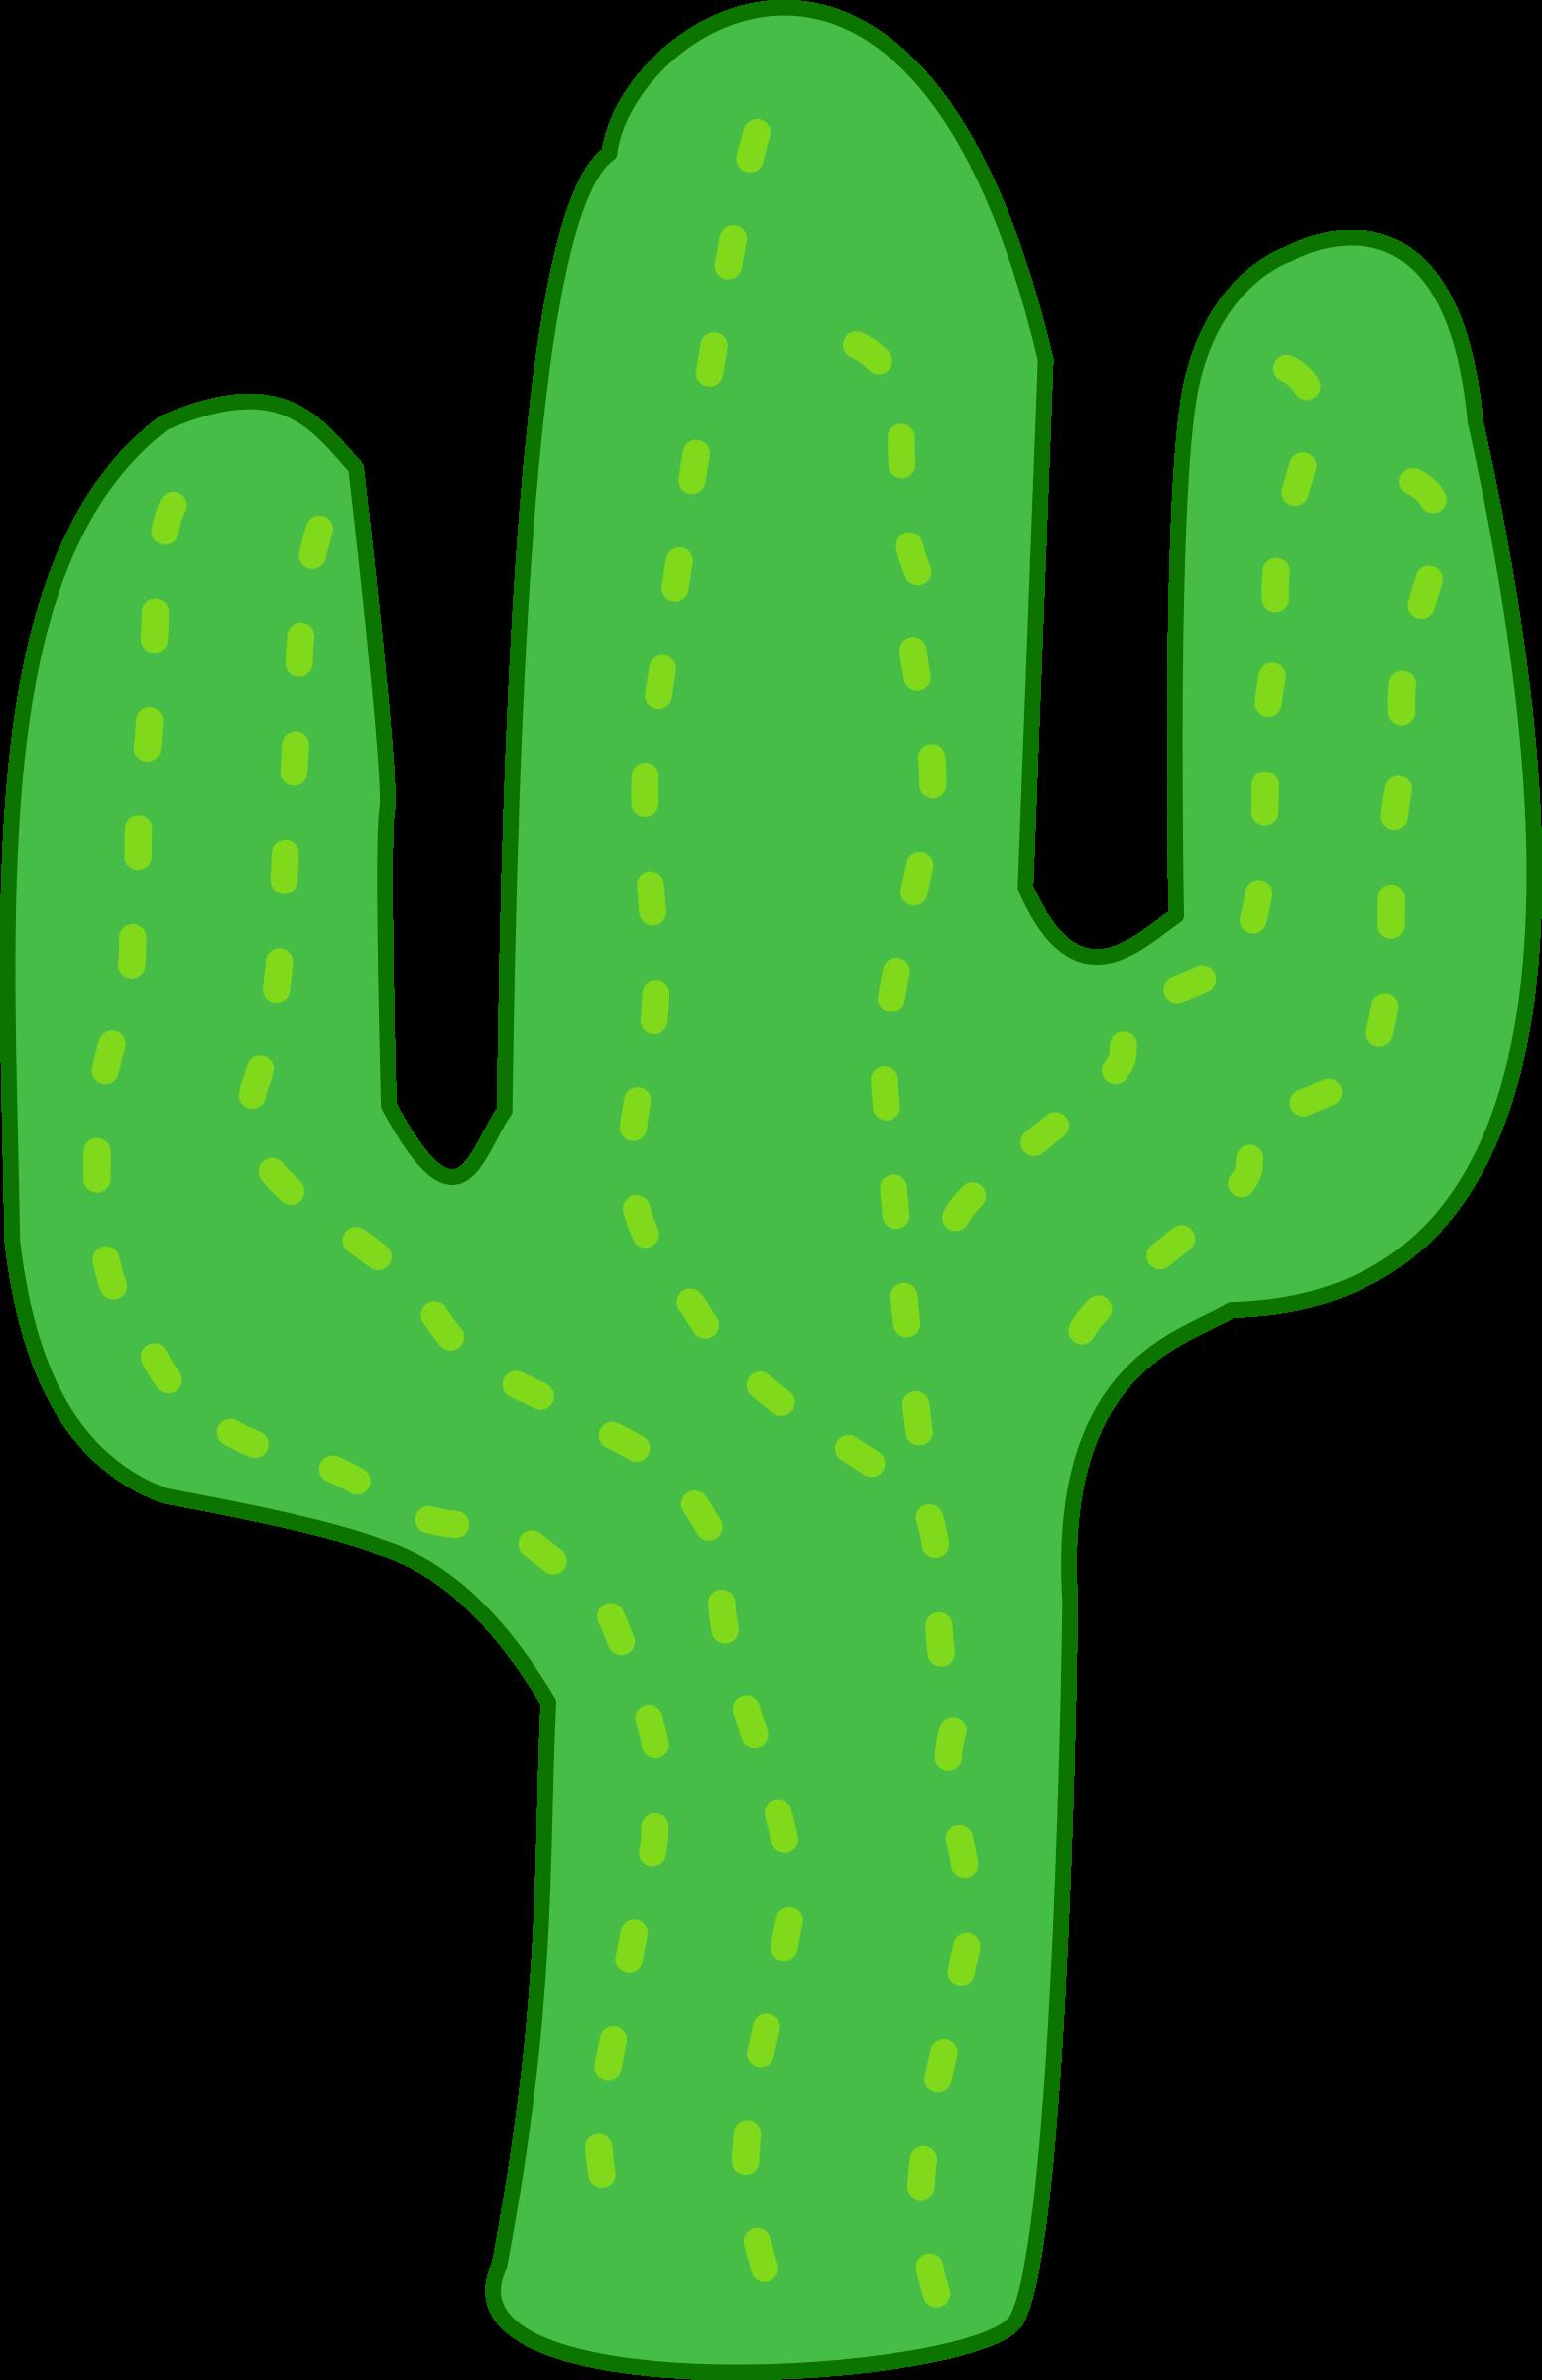 1555x2400 I'M A Hugger Silhouette Inspiration Cacti